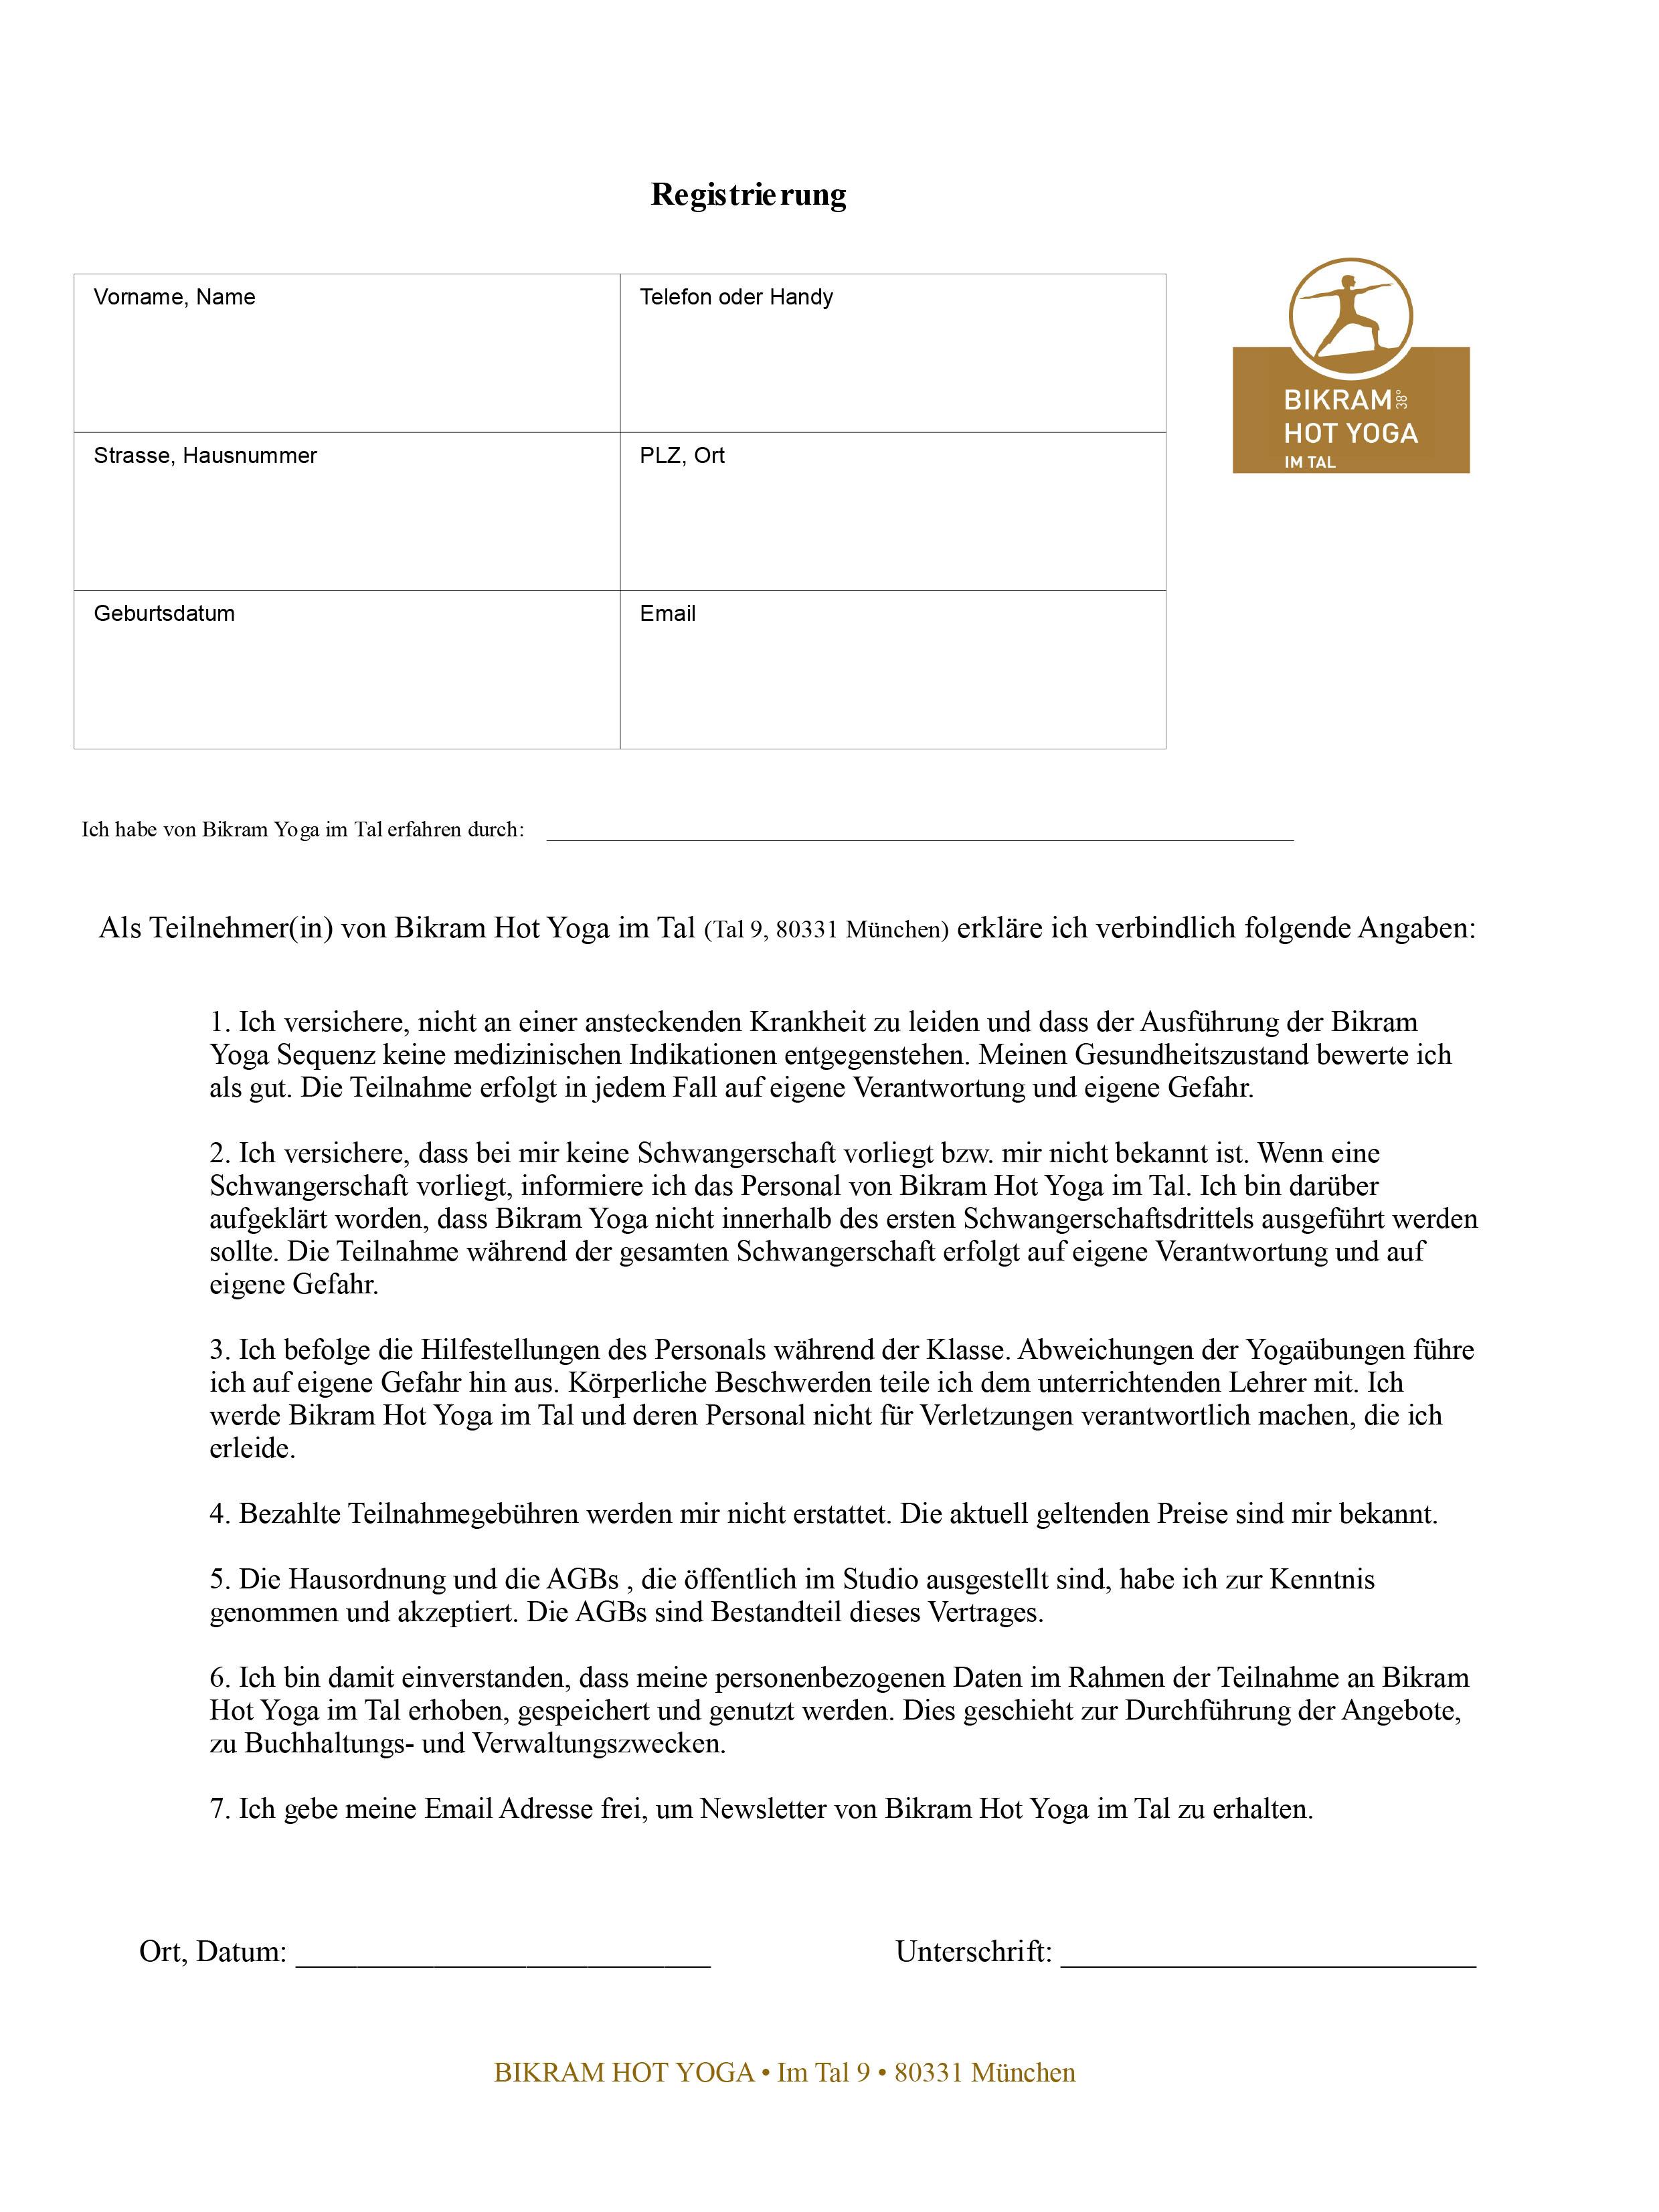 Registrierung-Bikram-Hot-Yoga-im-Tal